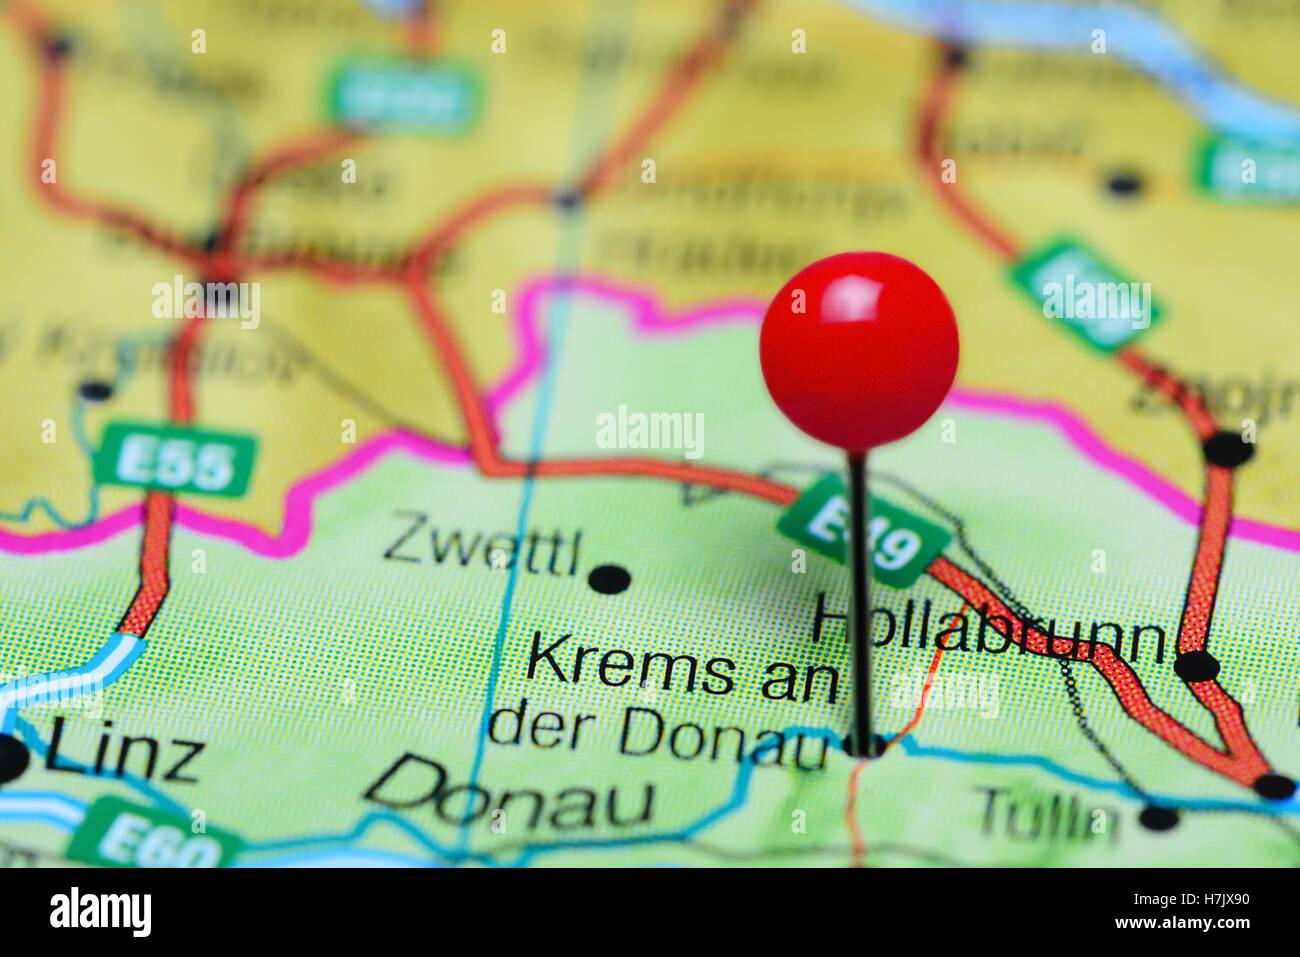 Krems an der Donau pinned on a map of Austria Stock Photo: 125190940 on lower austria, wien austria map, austria rail map, gmund austria map, grossglockner austria map, danube university krems, brussels austria map, althofen austria map, linz austria map, wiener neustadt austria map, budapest austria map, maria theresa of austria map, villach austria map, zell am see austria map, rohrau austria map, bregenz austria map, wiener neustadt, strasbourg austria map, eisenstadt austria map, ybbs an der donau, graz austria map, salzburg austria map, ternitz austria map, durnstein austria map,